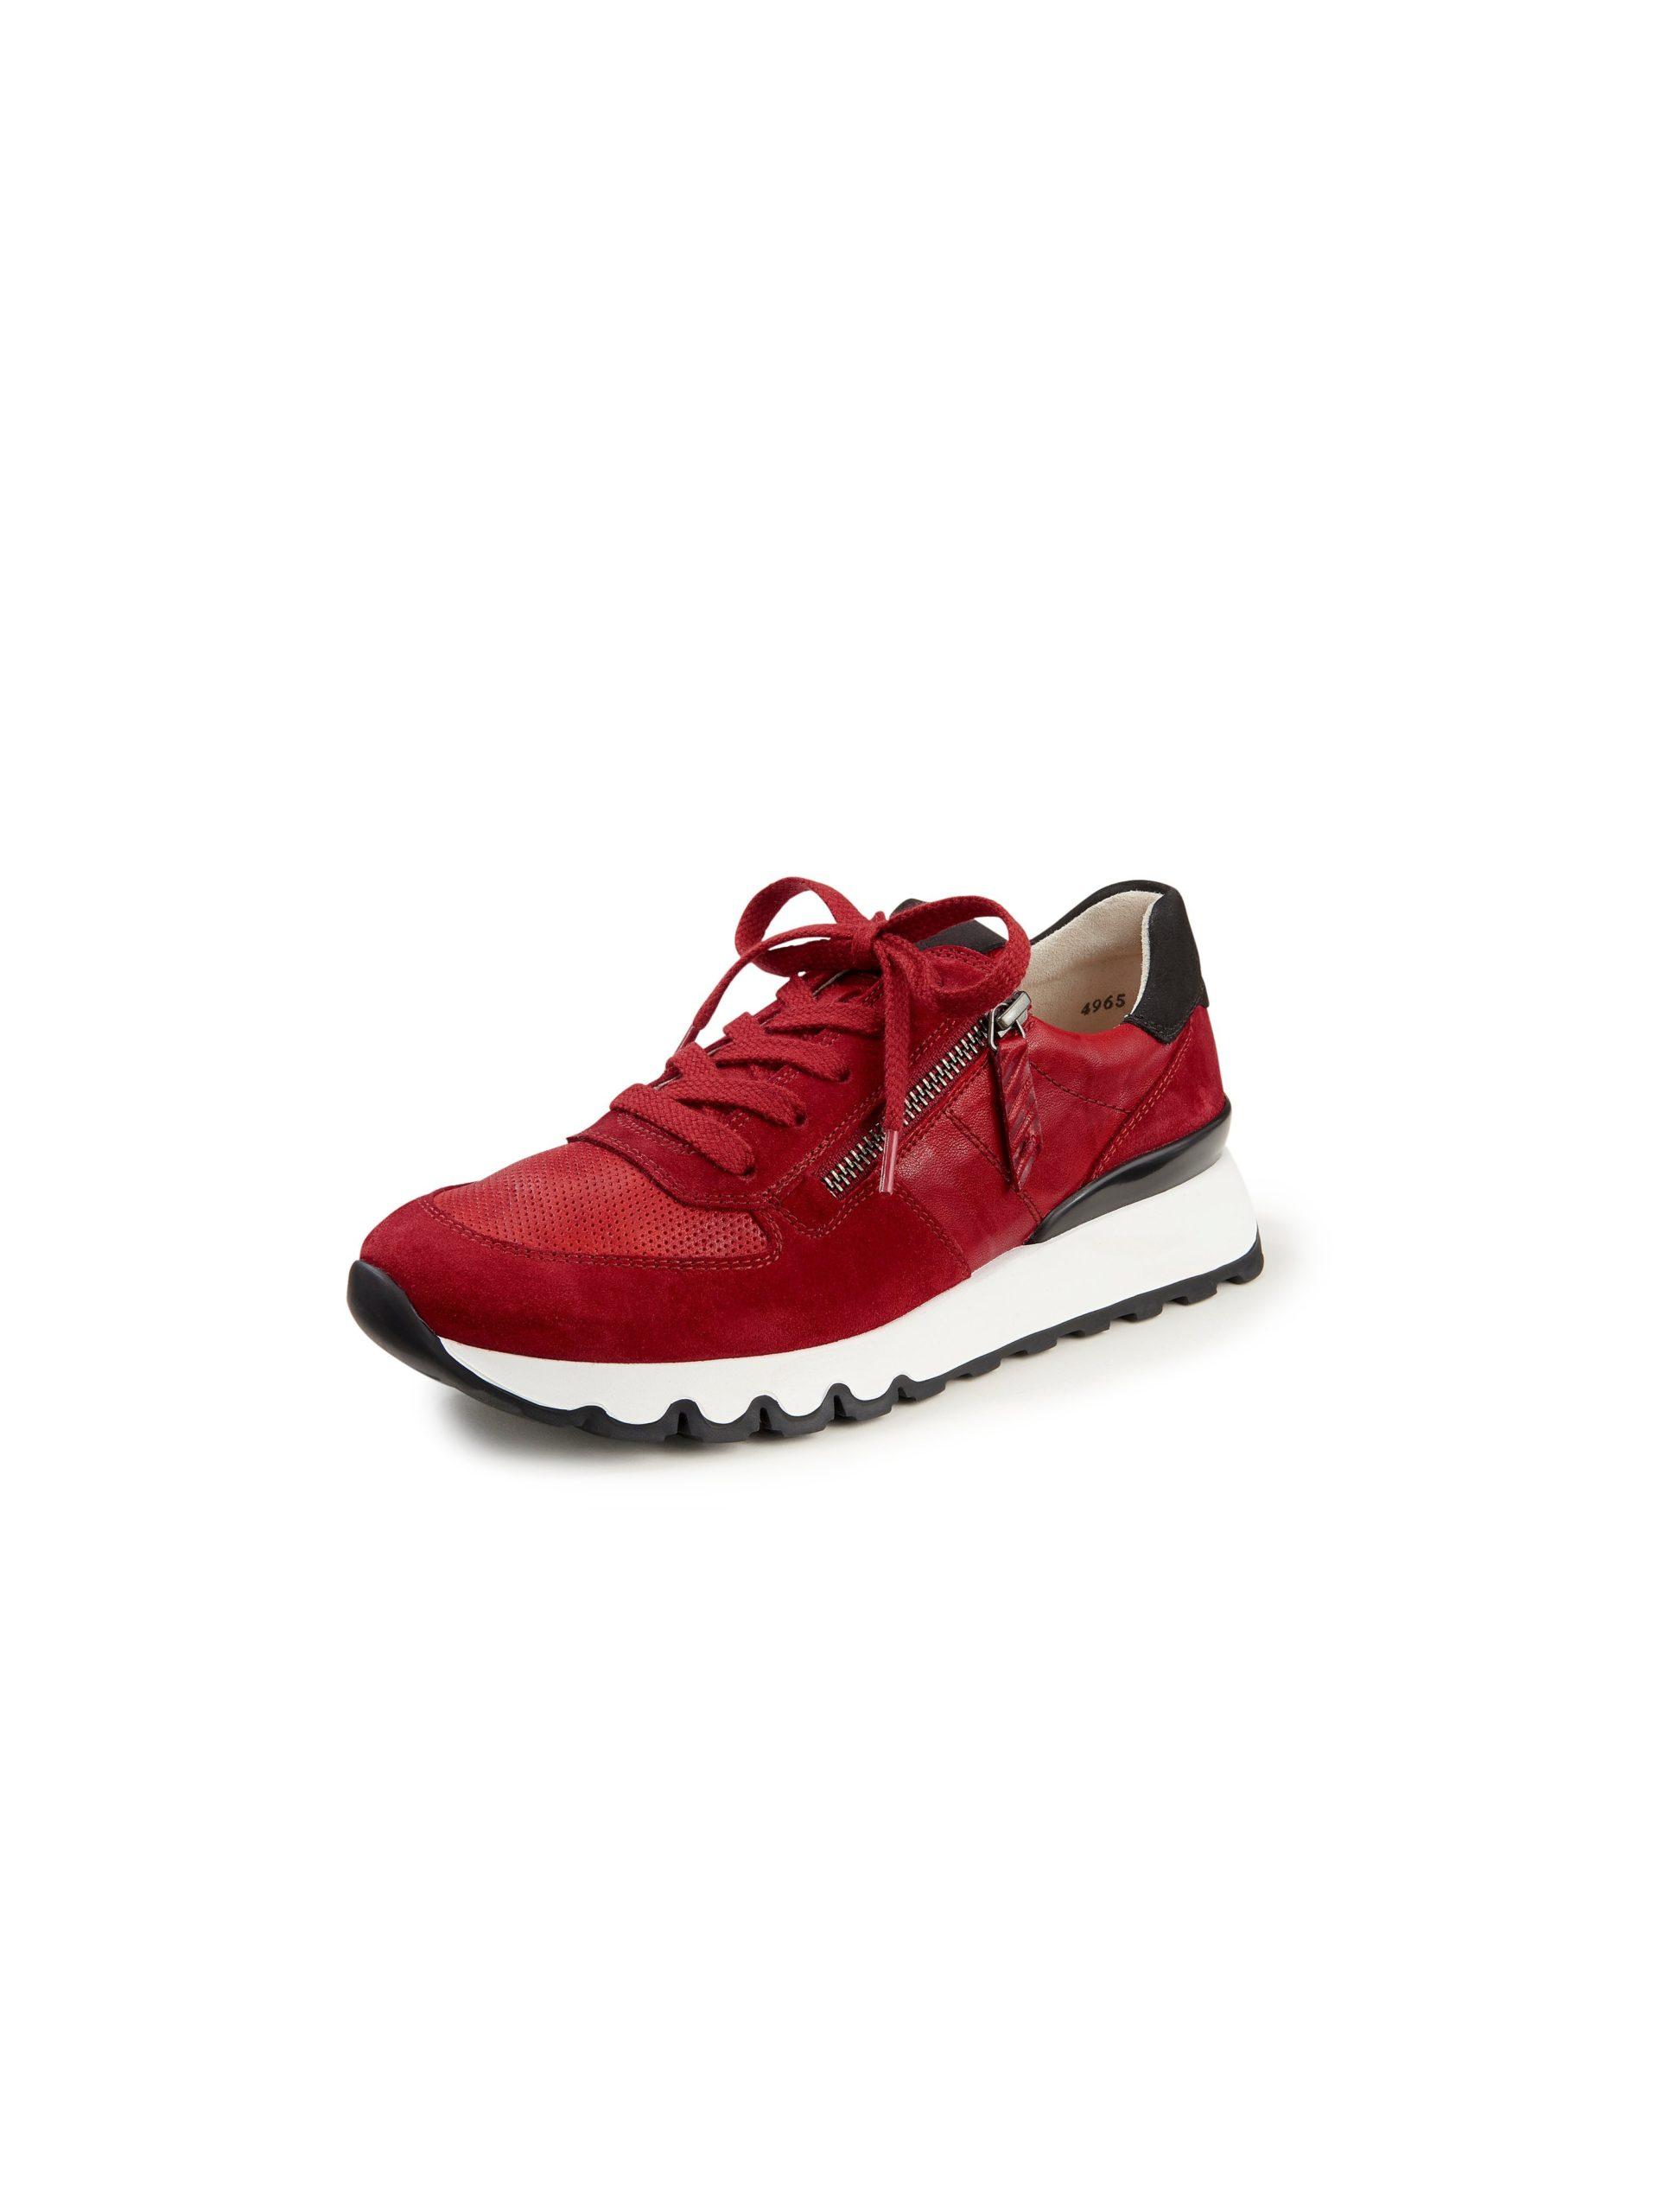 Sneakers van leer Van Paul Green rood Kopen